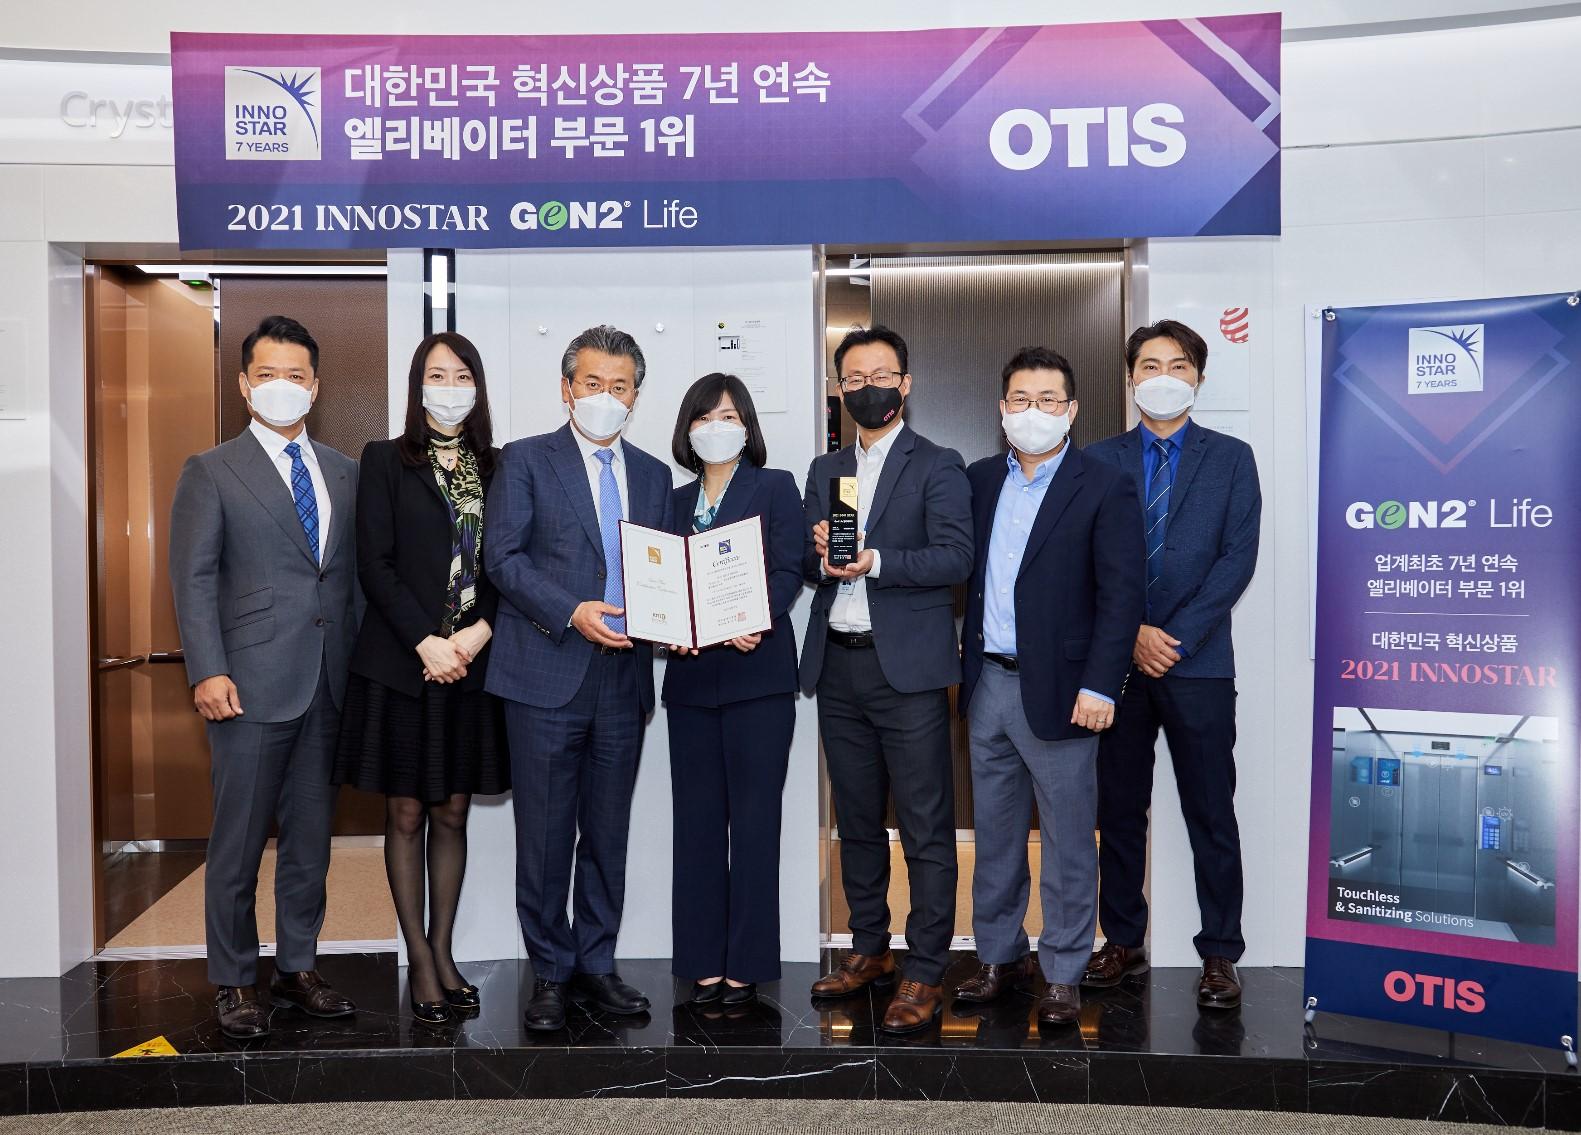 Korea's Innostar award